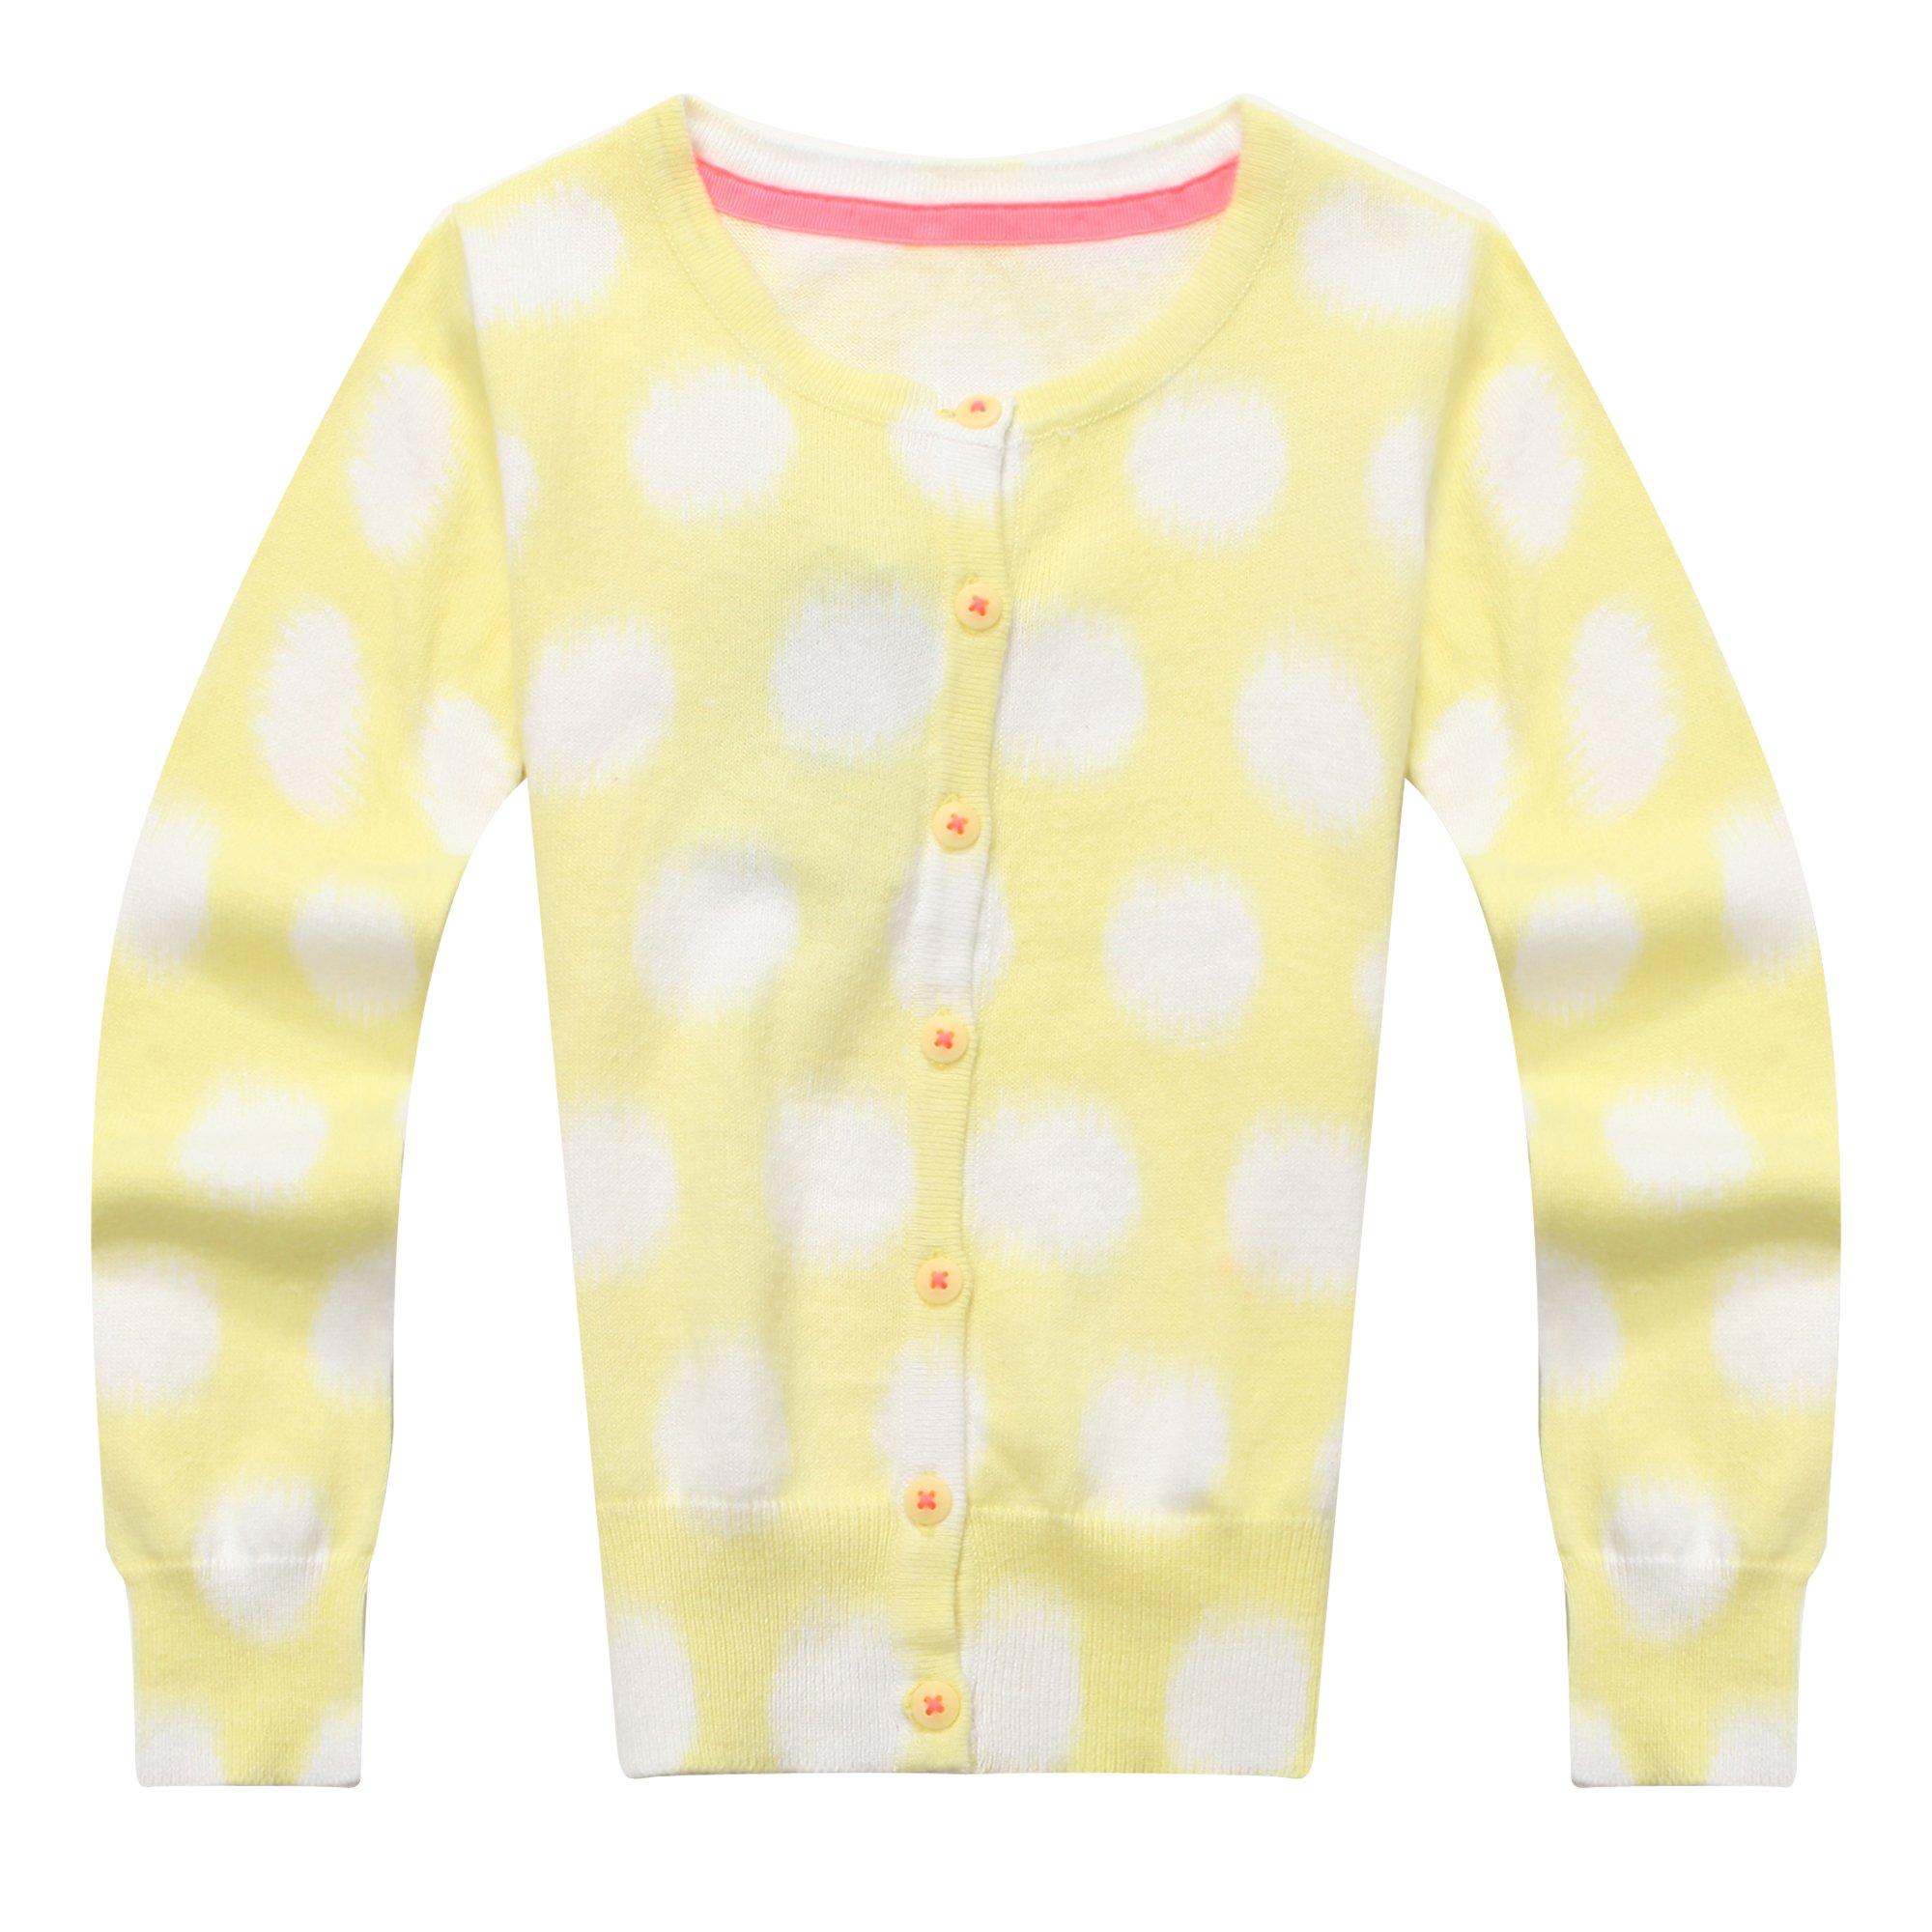 Richie House Little Girls' Cardigan in Dot Printing RH1102-3/4